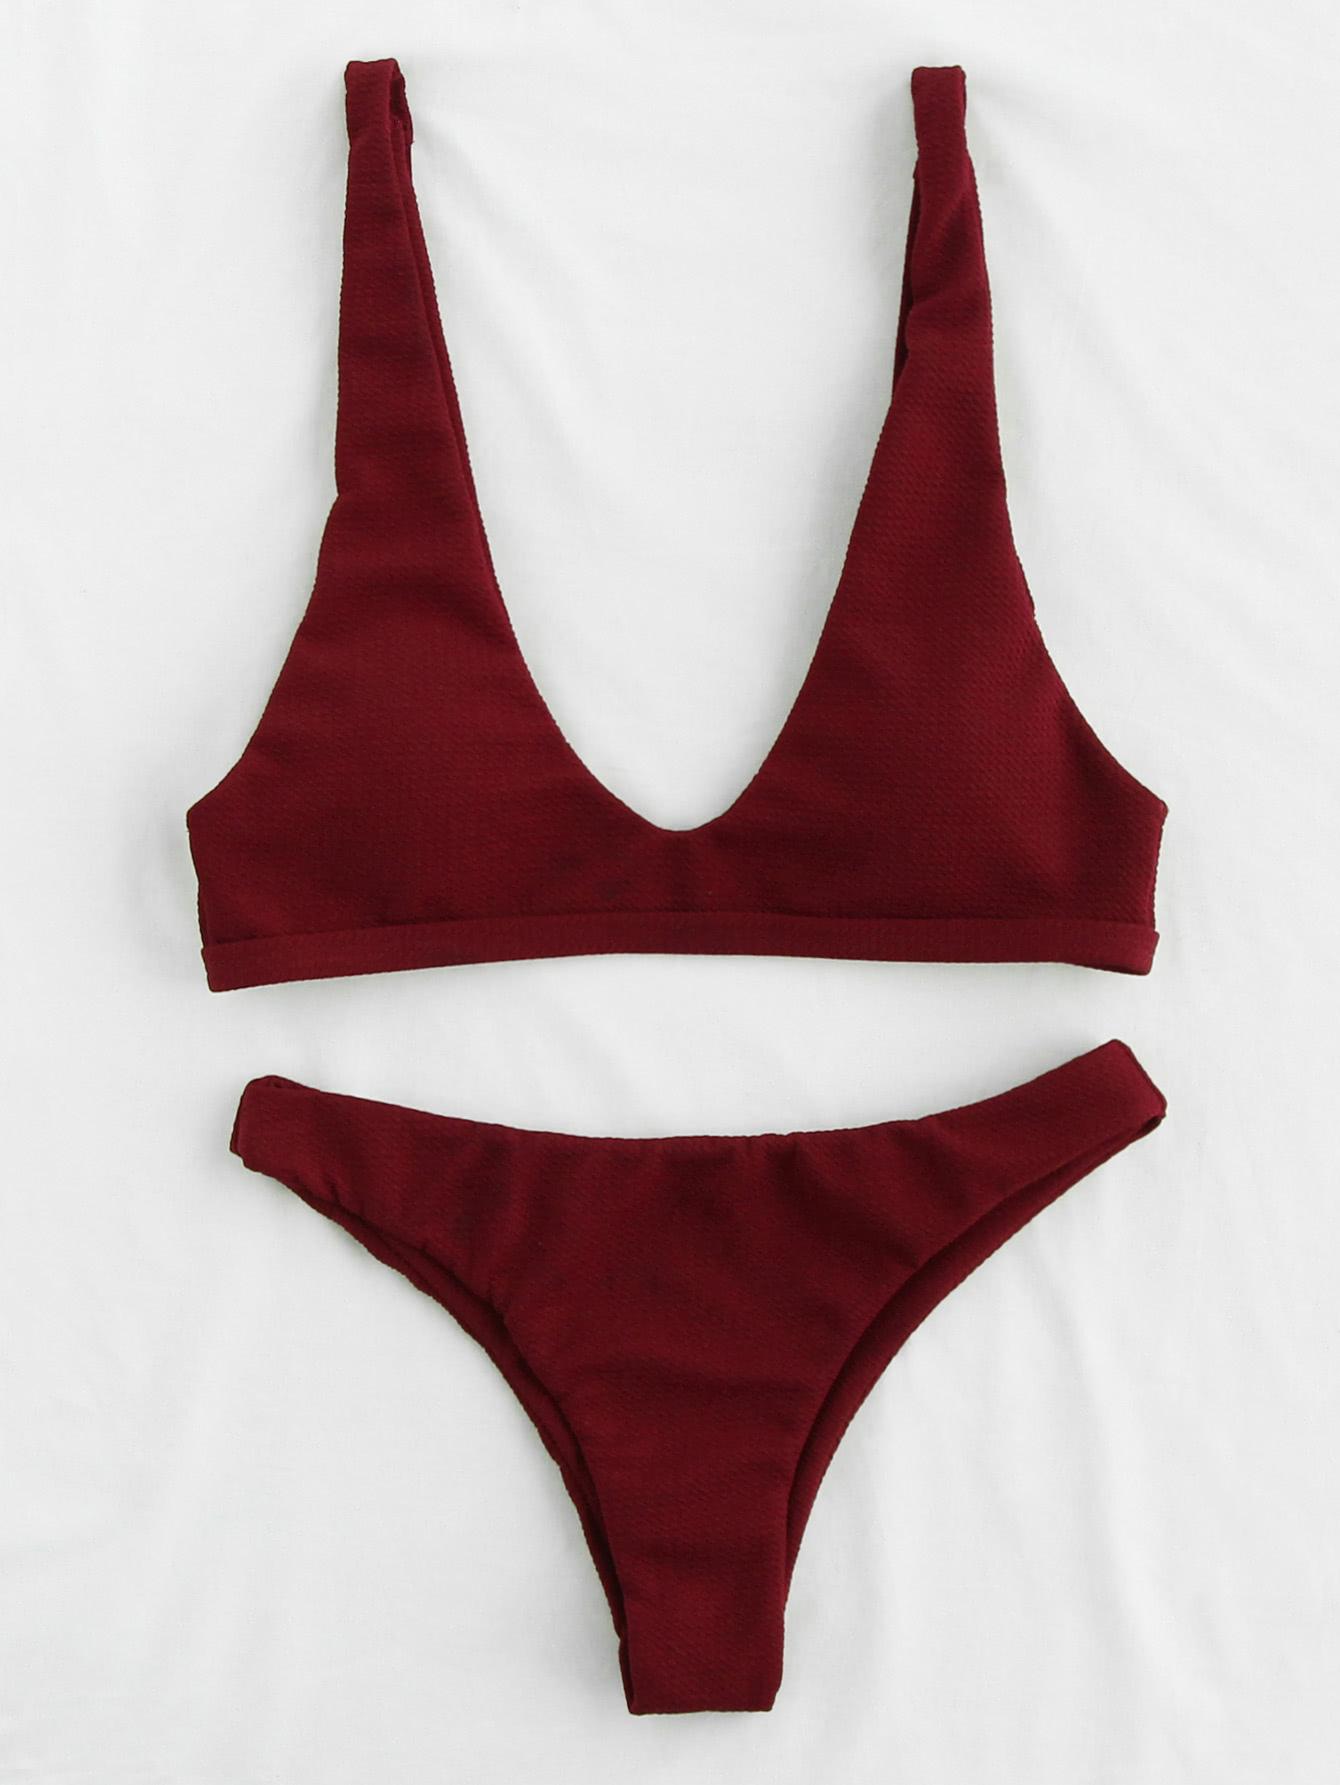 022c111e37 KOZ1.com | Shop for latest women's fashion dresses, tops, bottoms.